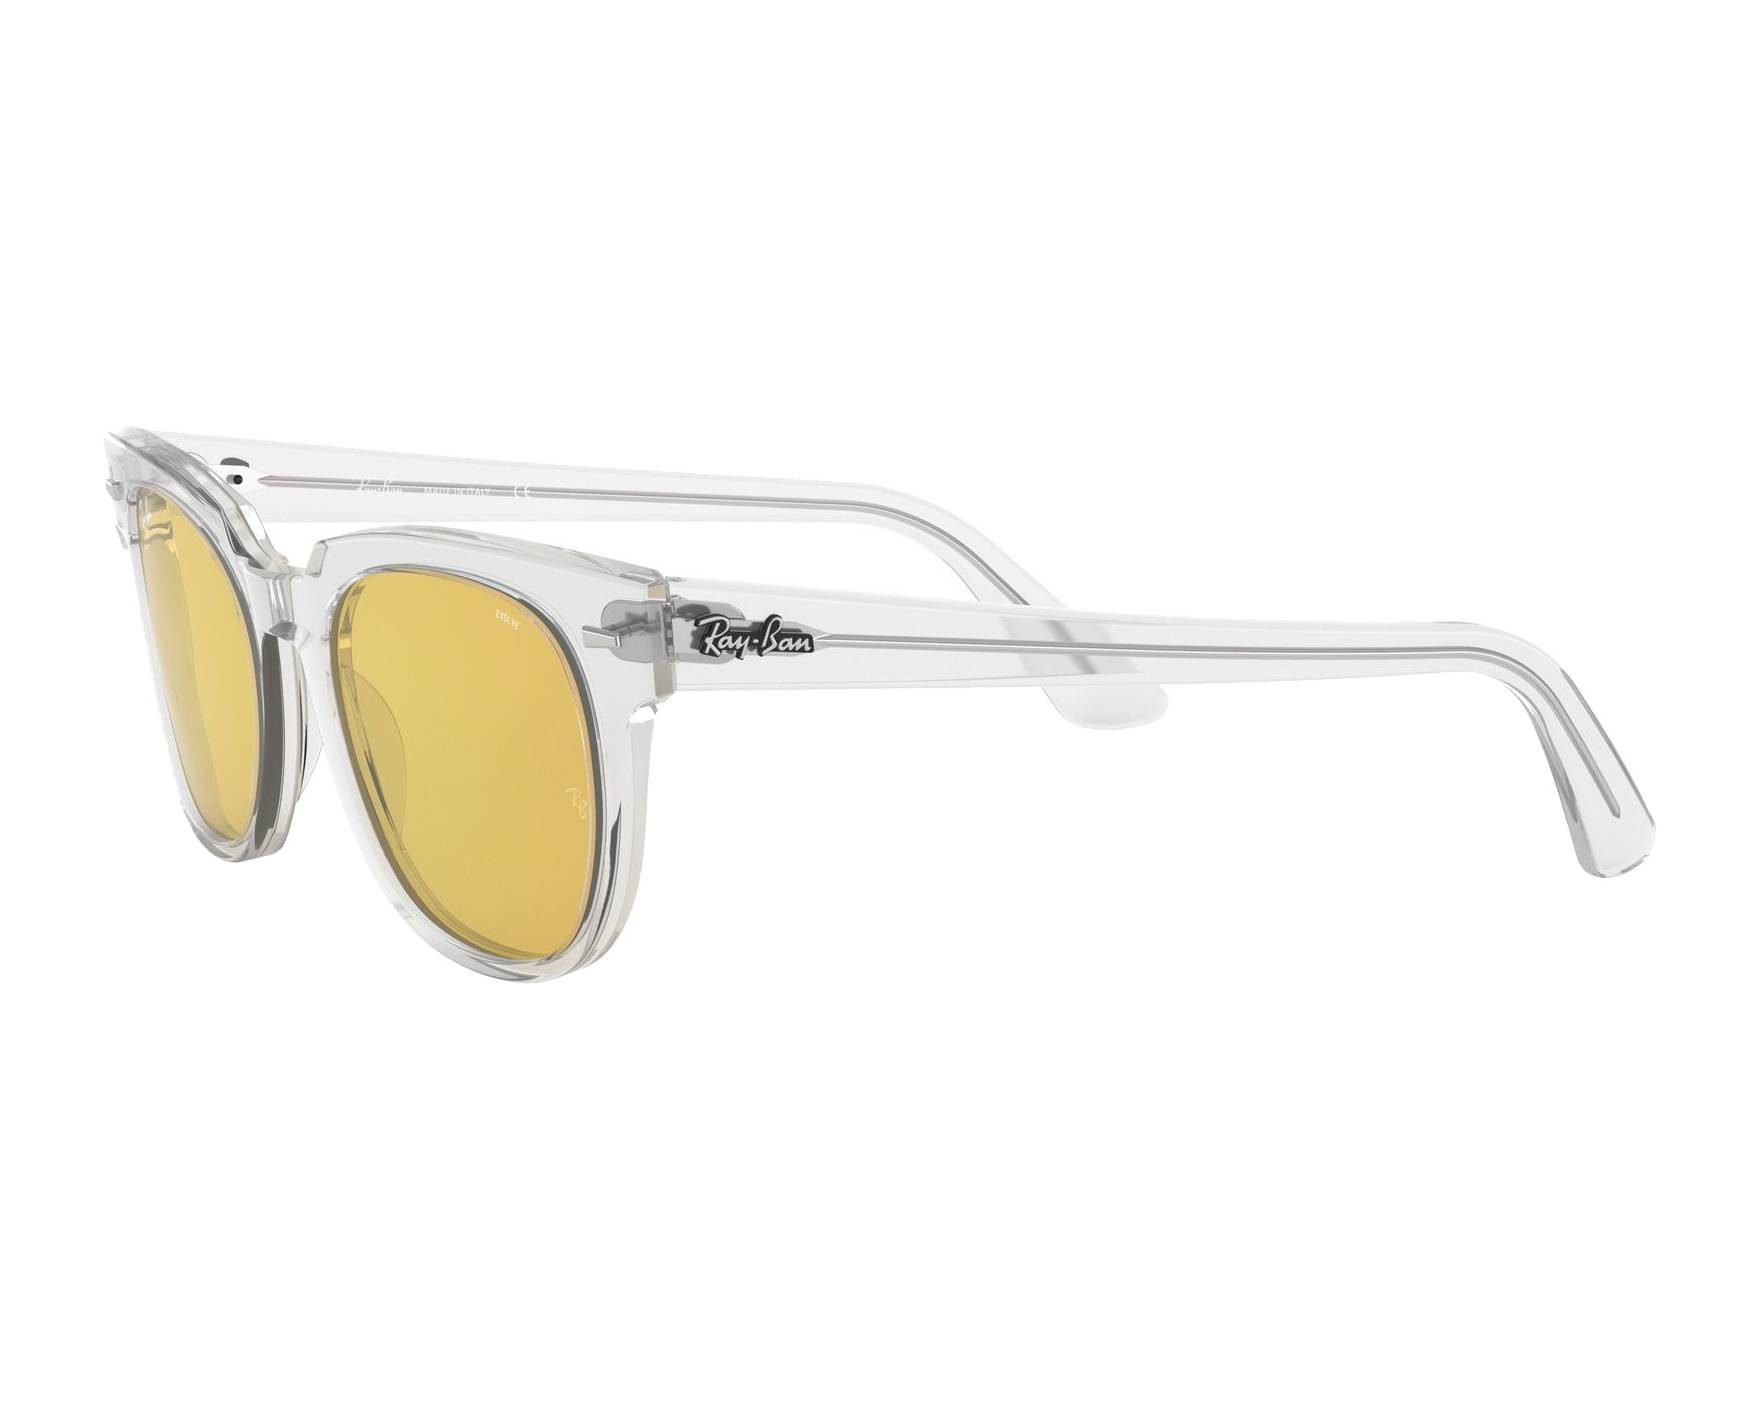 50b86c82b6d Sunglasses Ray-Ban RB-2168 912 4A 50-20 Crystal 360 degree